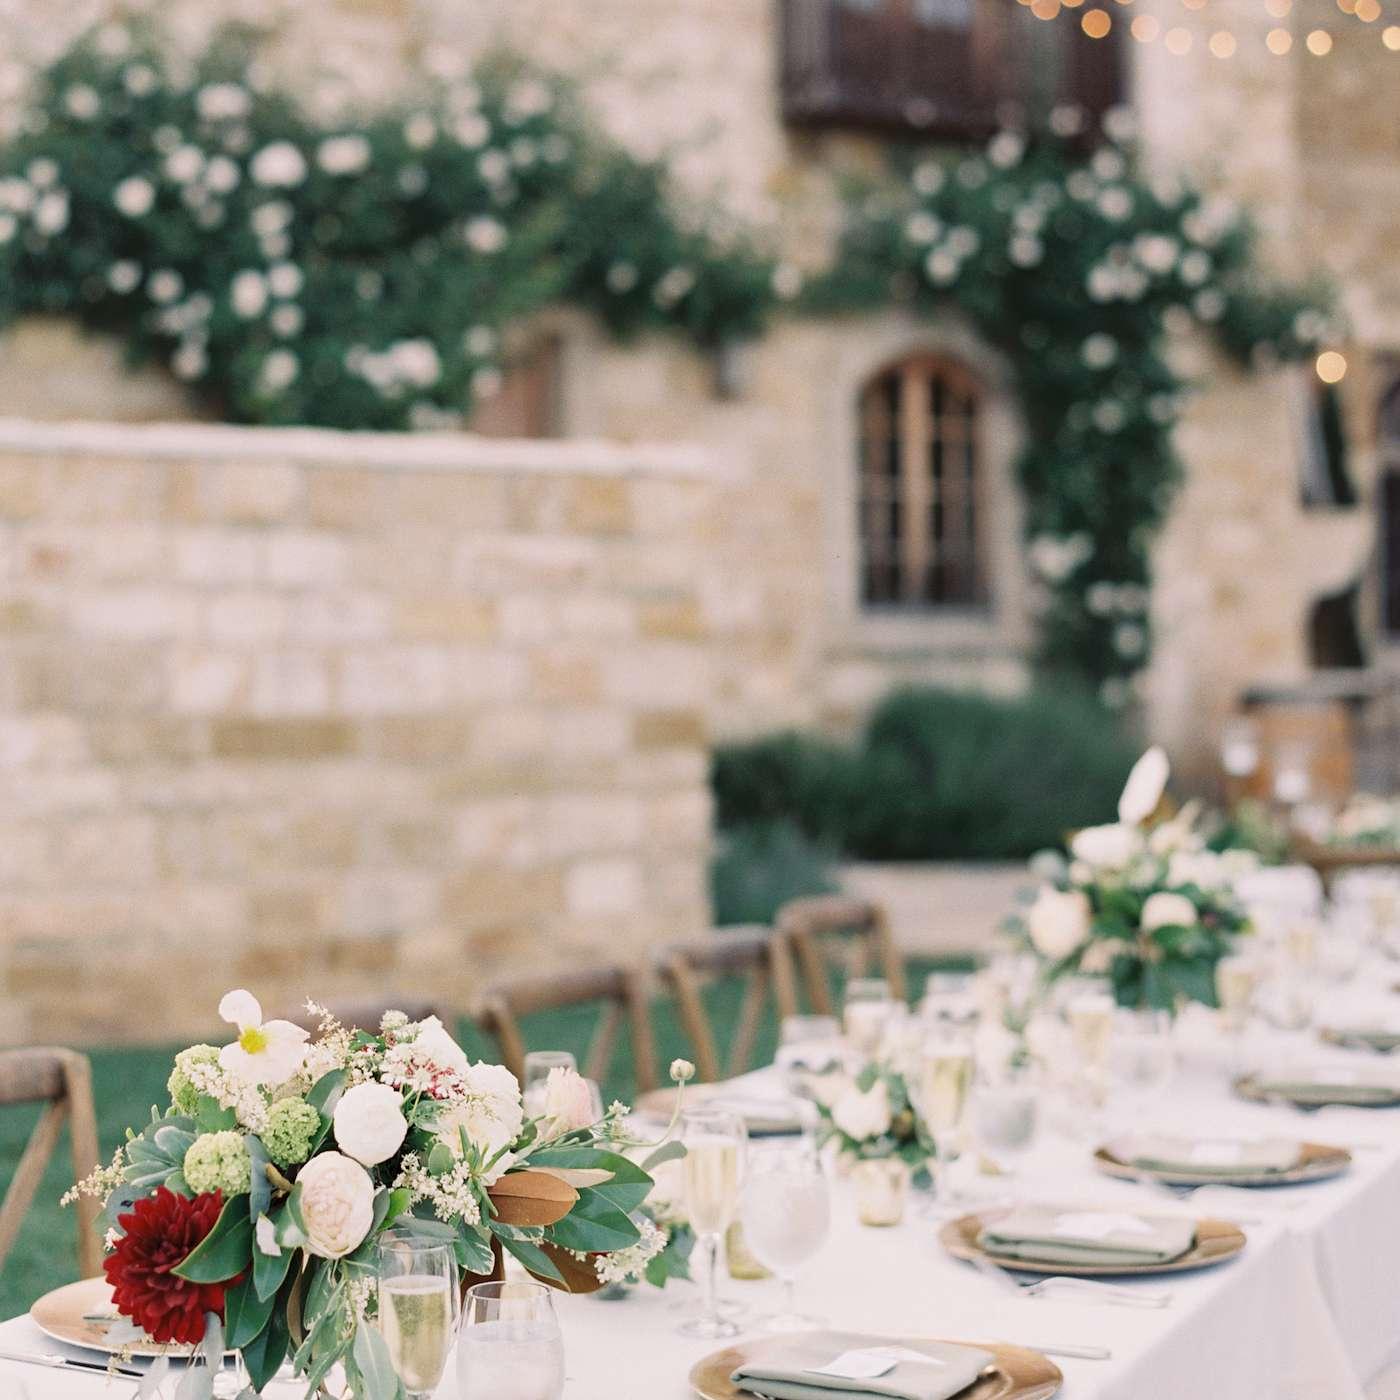 <p>A minimal tablescape with assorted floral arrangements.</p>